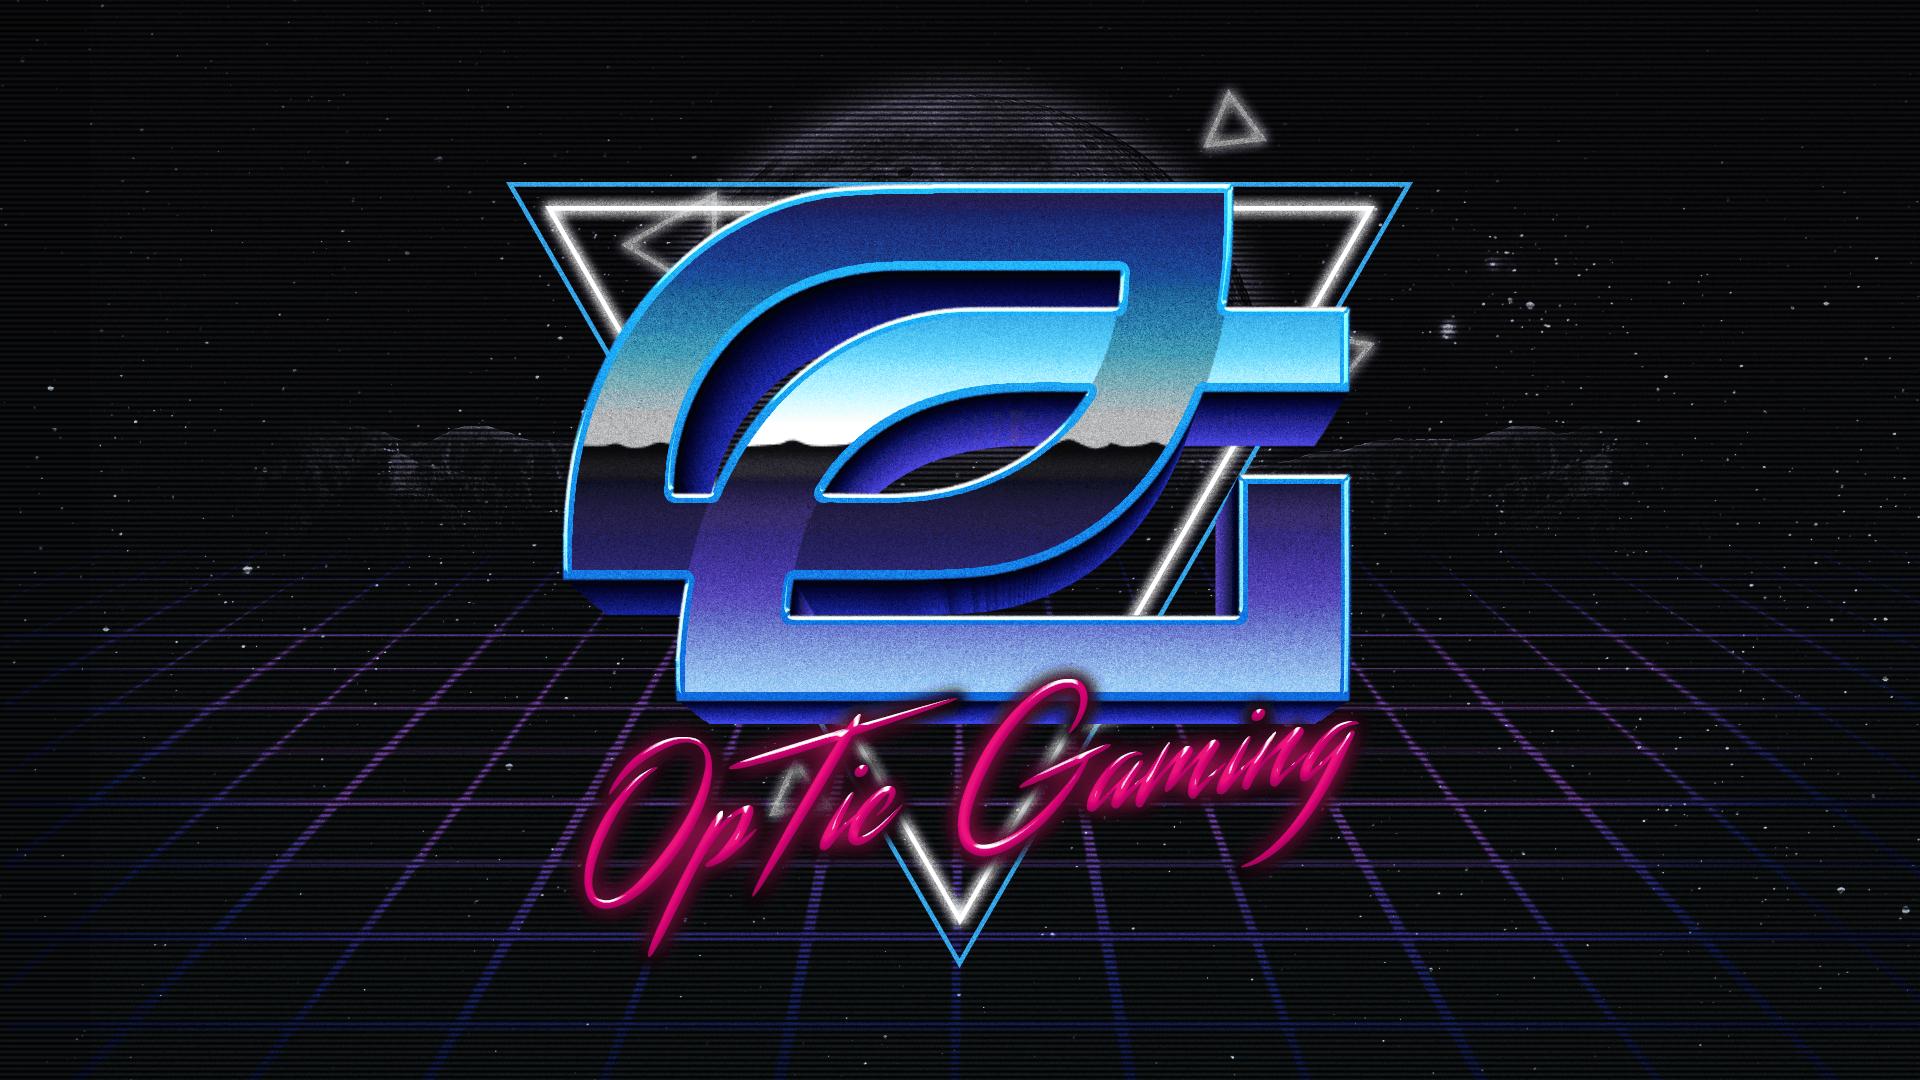 optic gaming wallpaper6 - photo #30